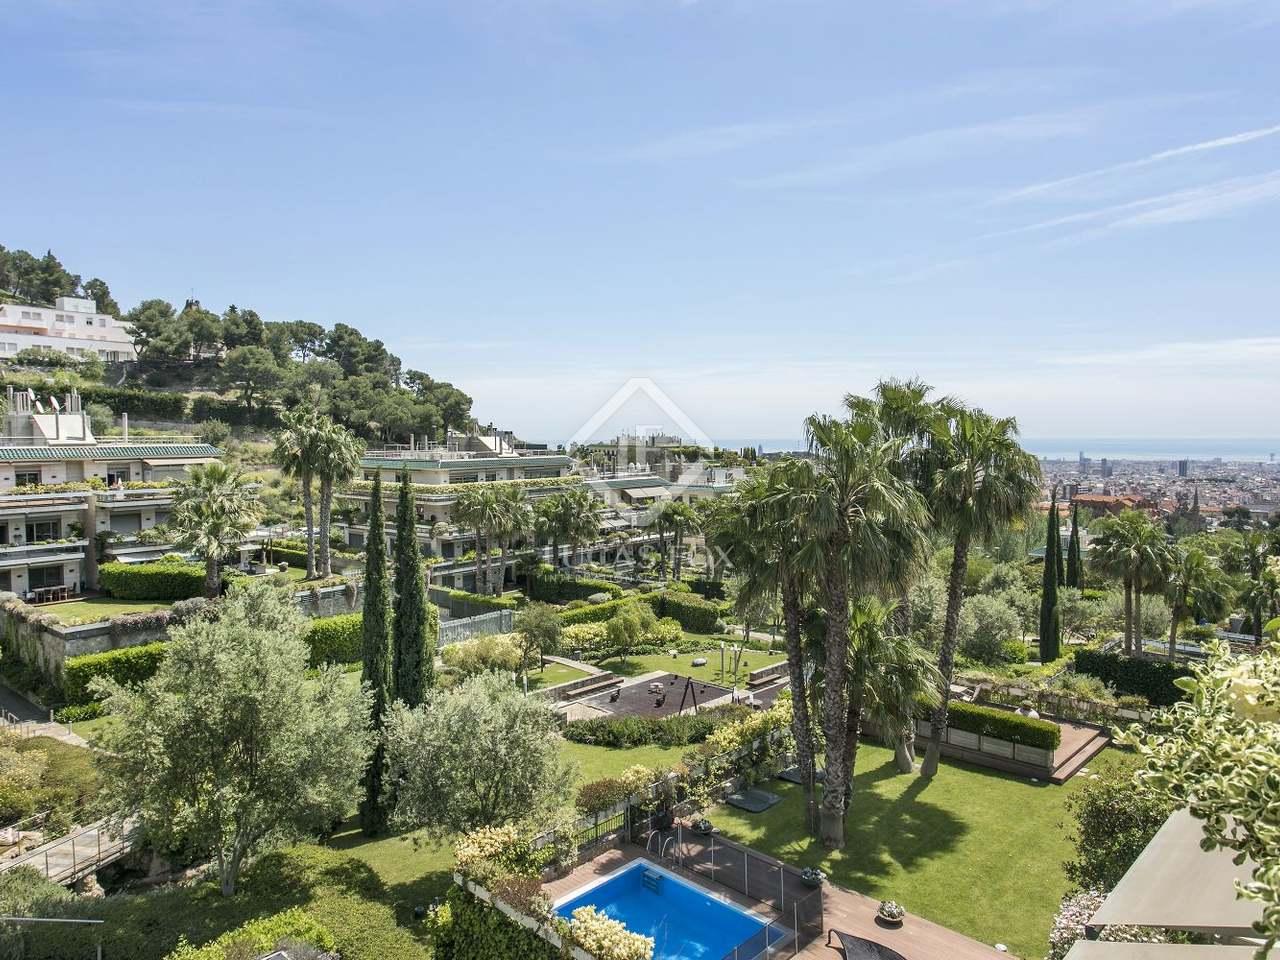 Appartement de 217m a louer sant gervasi la bonanova for Piscine w barcelone